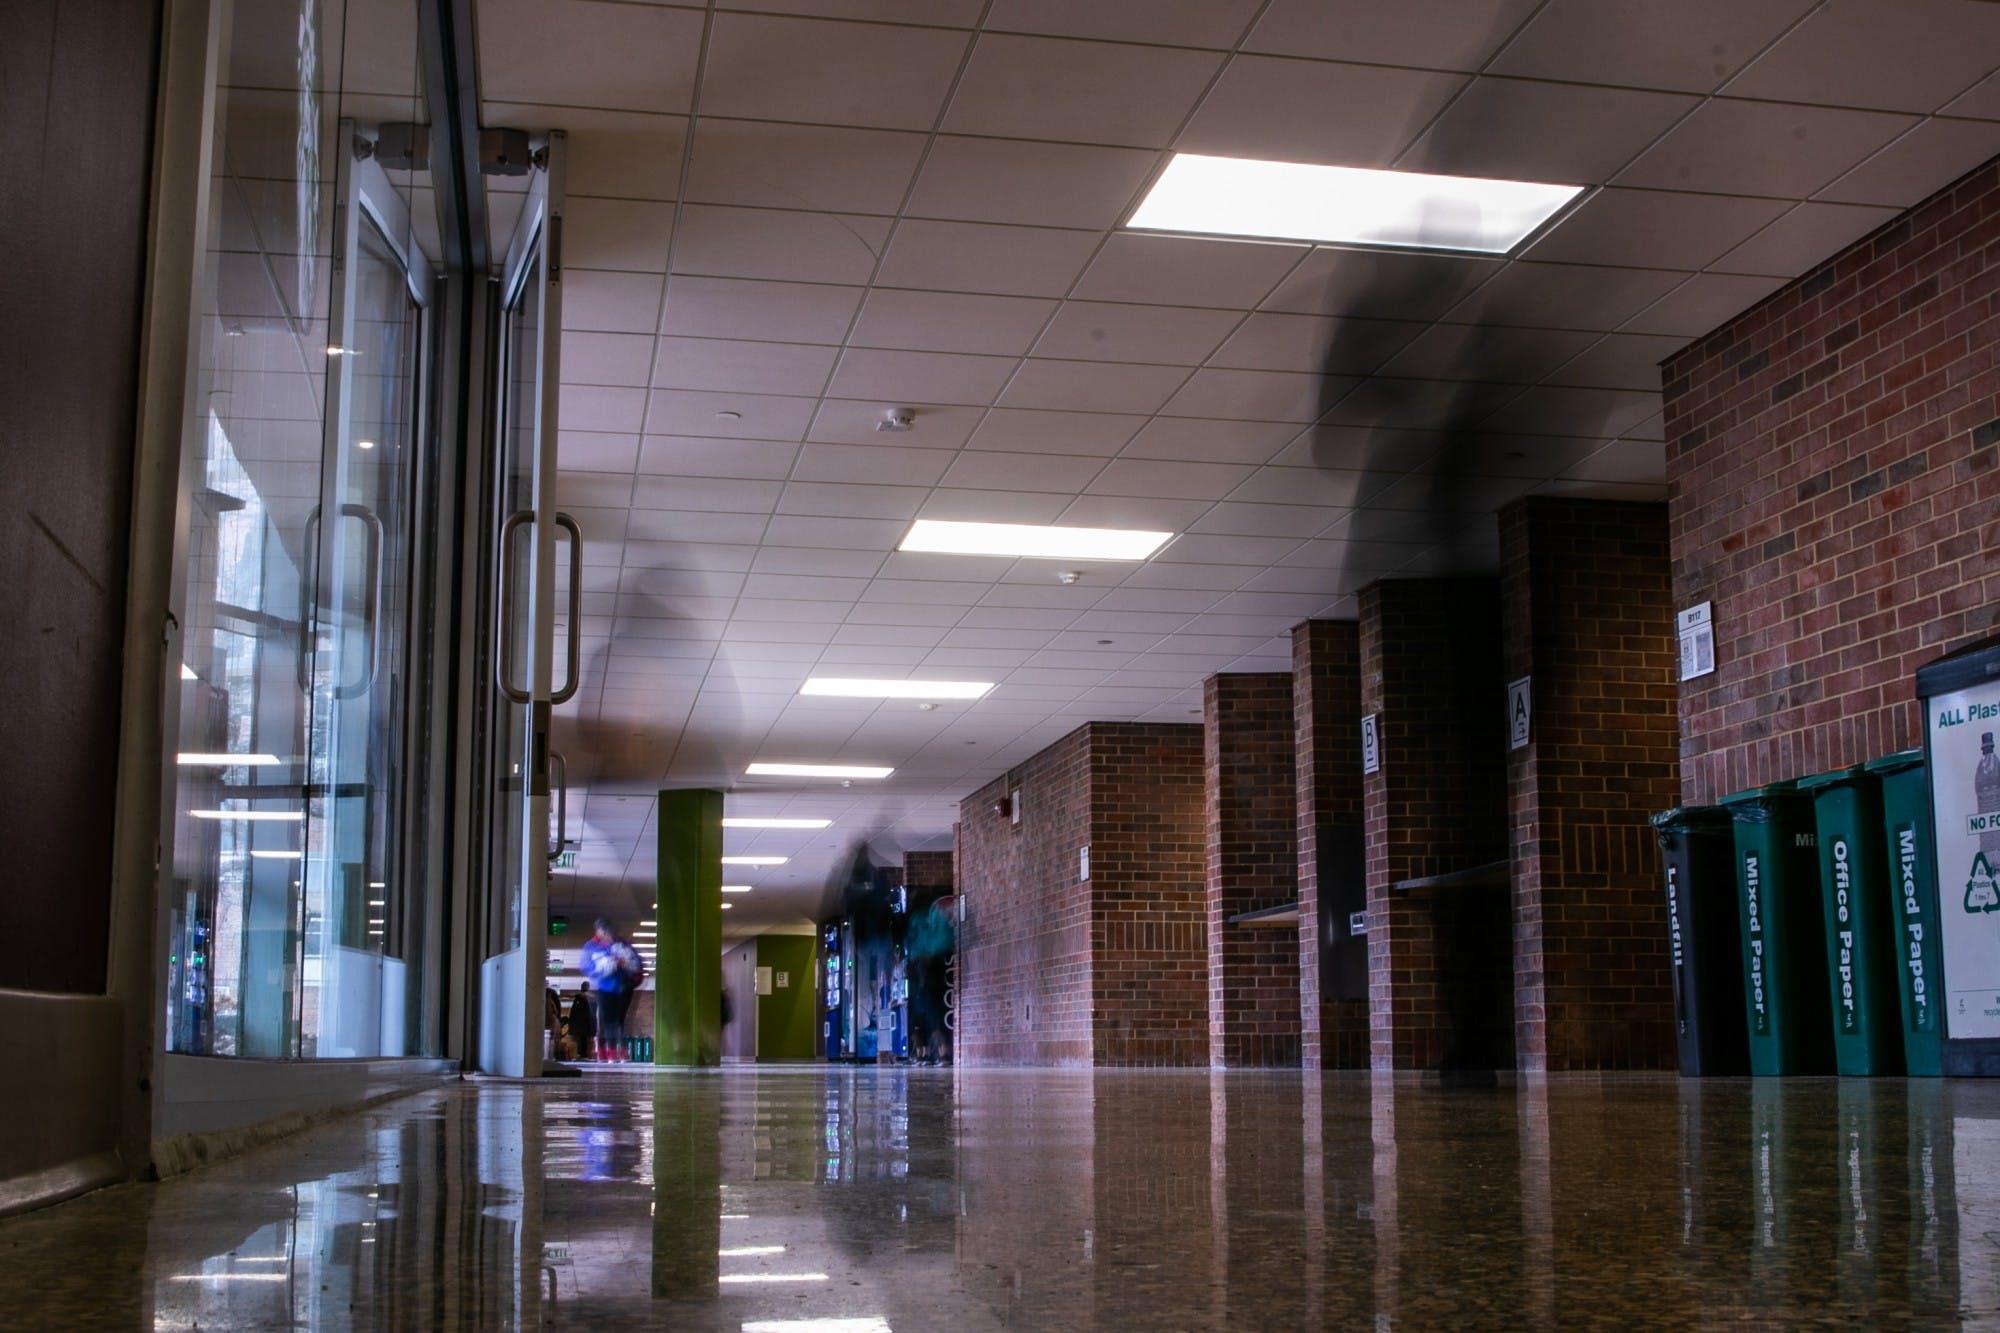 People walk through a mostly empty academic building hallway.